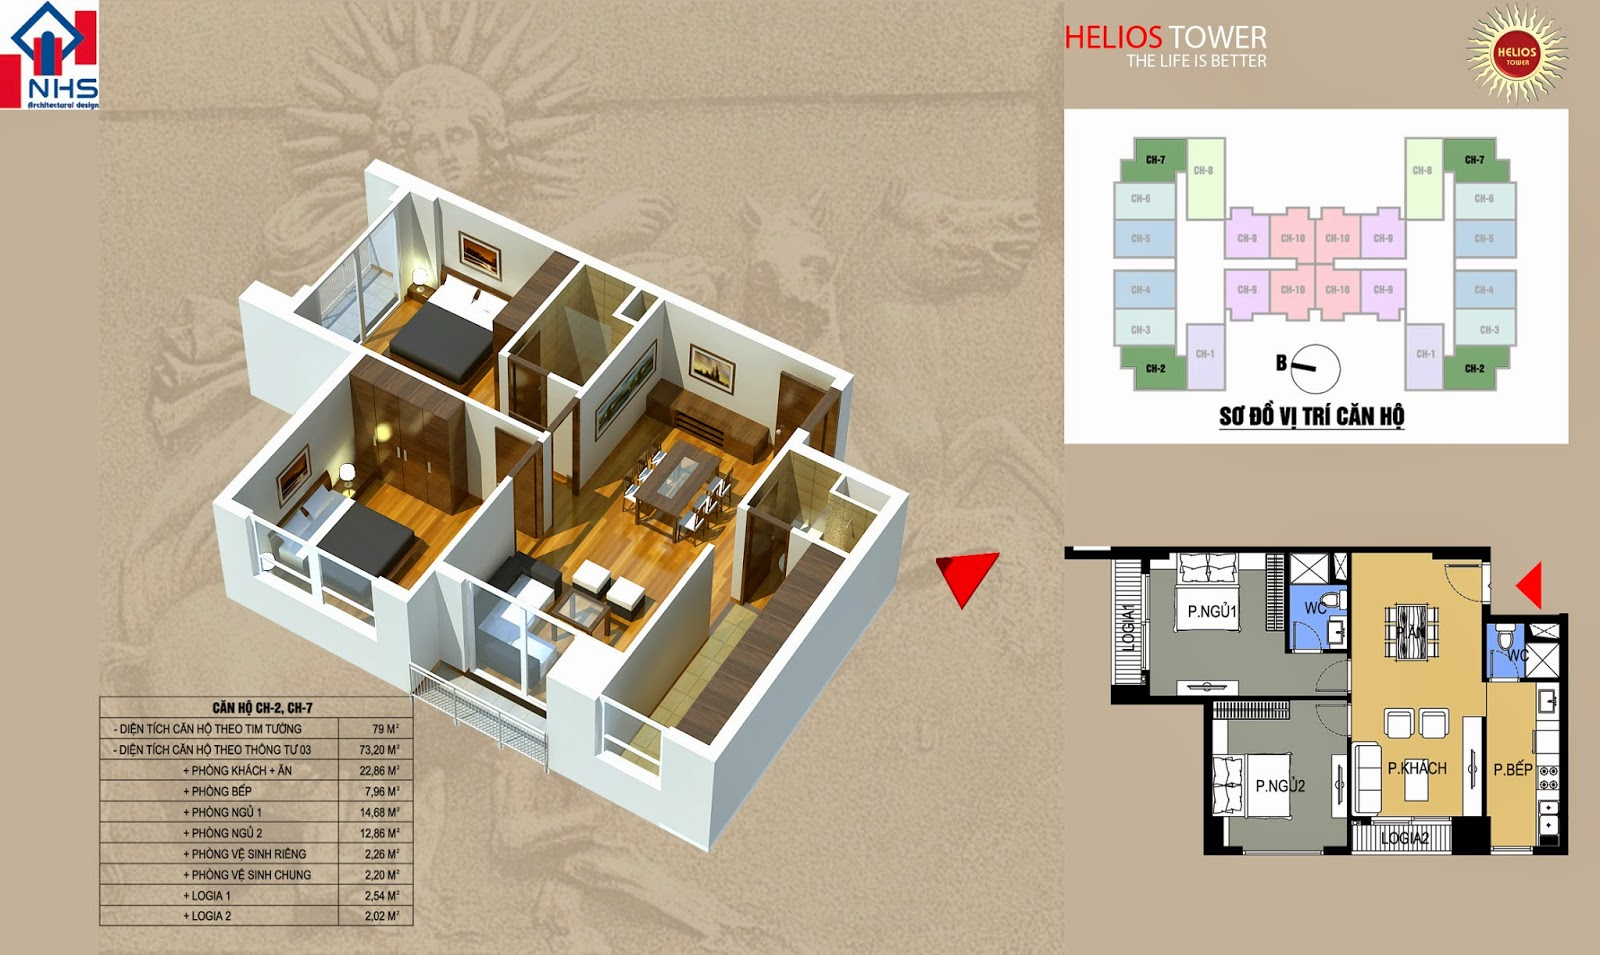 Căn 02 07 Helios Tower 75 Tam Trinh